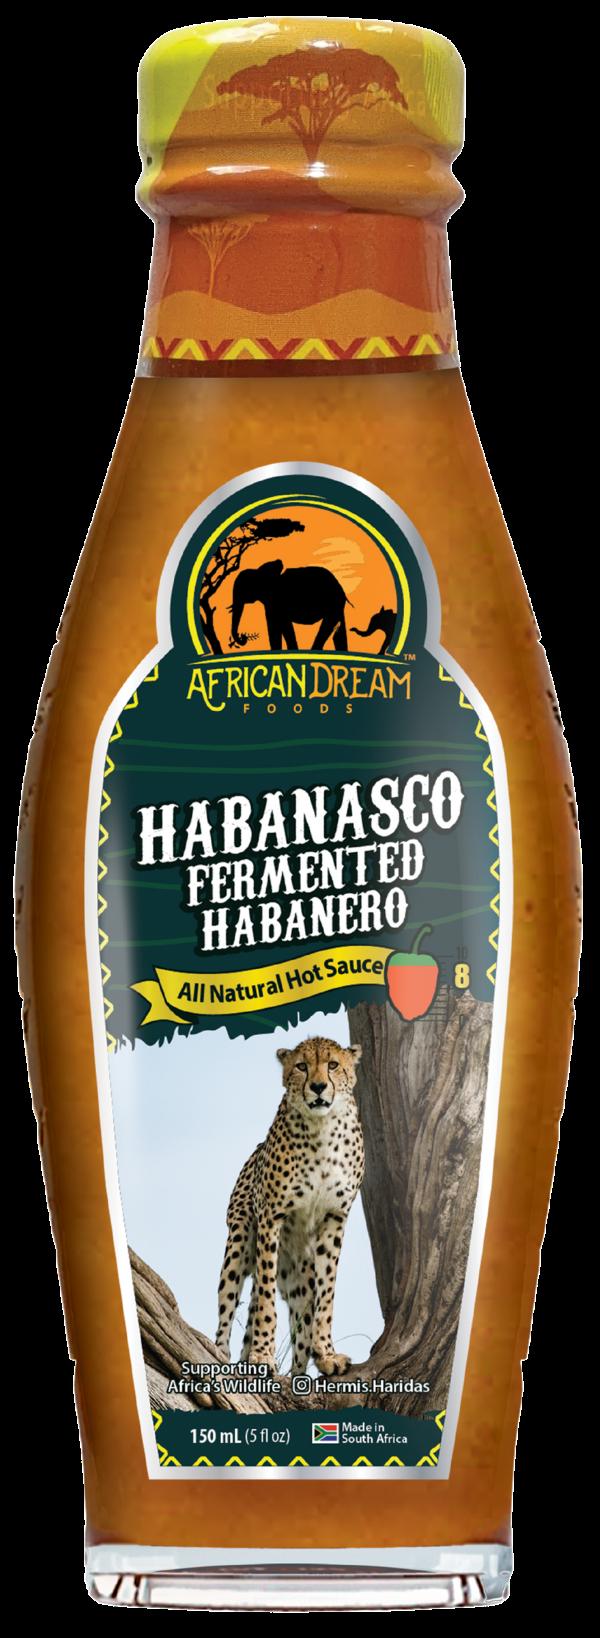 Habanasco - Fermented Habanero Hot Sauce